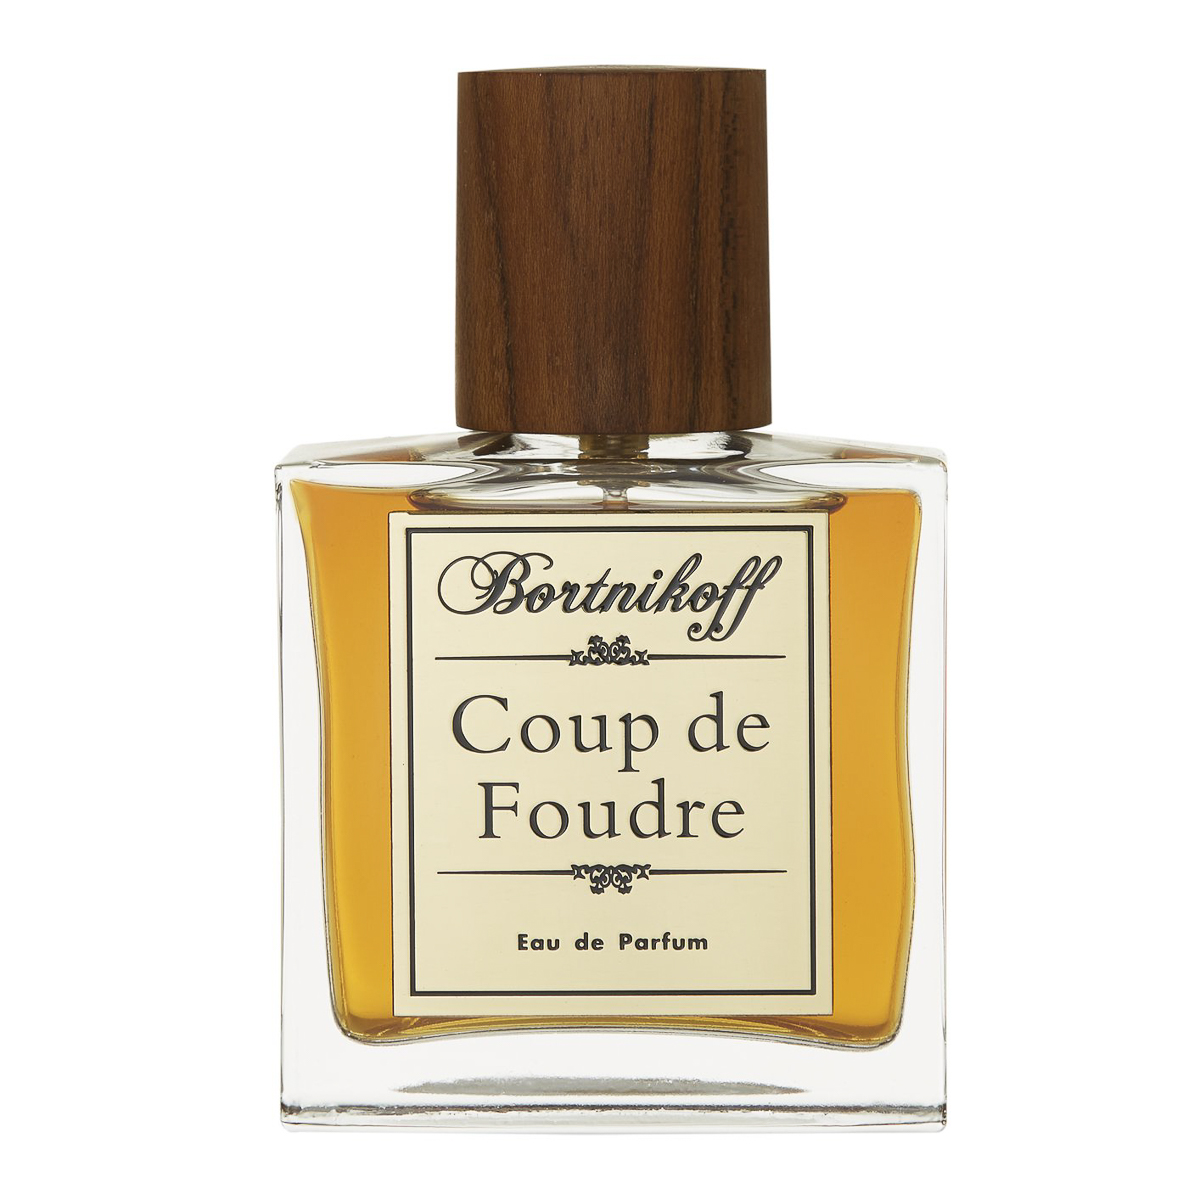 Bortnikoff & Freshness How Trends Change Artisanal Perfumery + ...